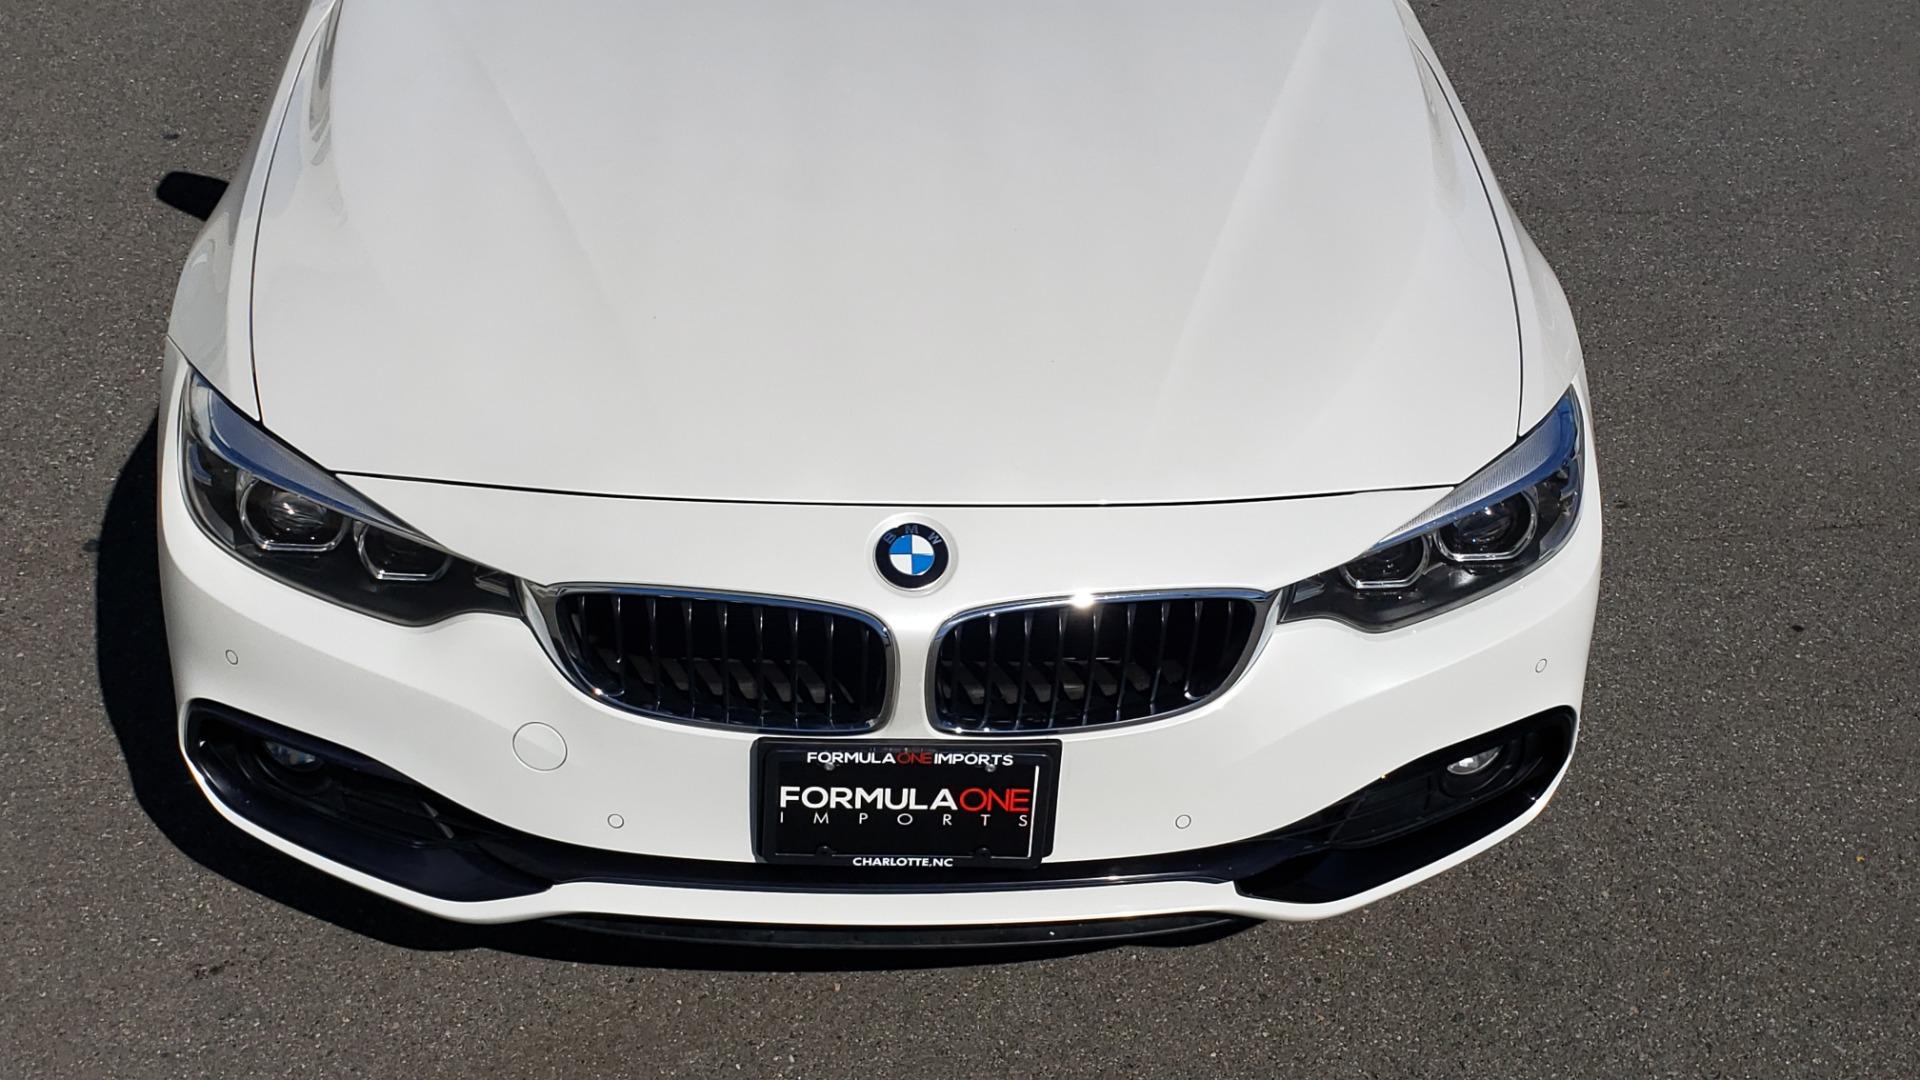 Used 2018 BMW 4 SERIES 430IXDRIVE / PREMIUM / NAV / SUNROOF / ESSENTIALS PKG for sale $27,795 at Formula Imports in Charlotte NC 28227 27